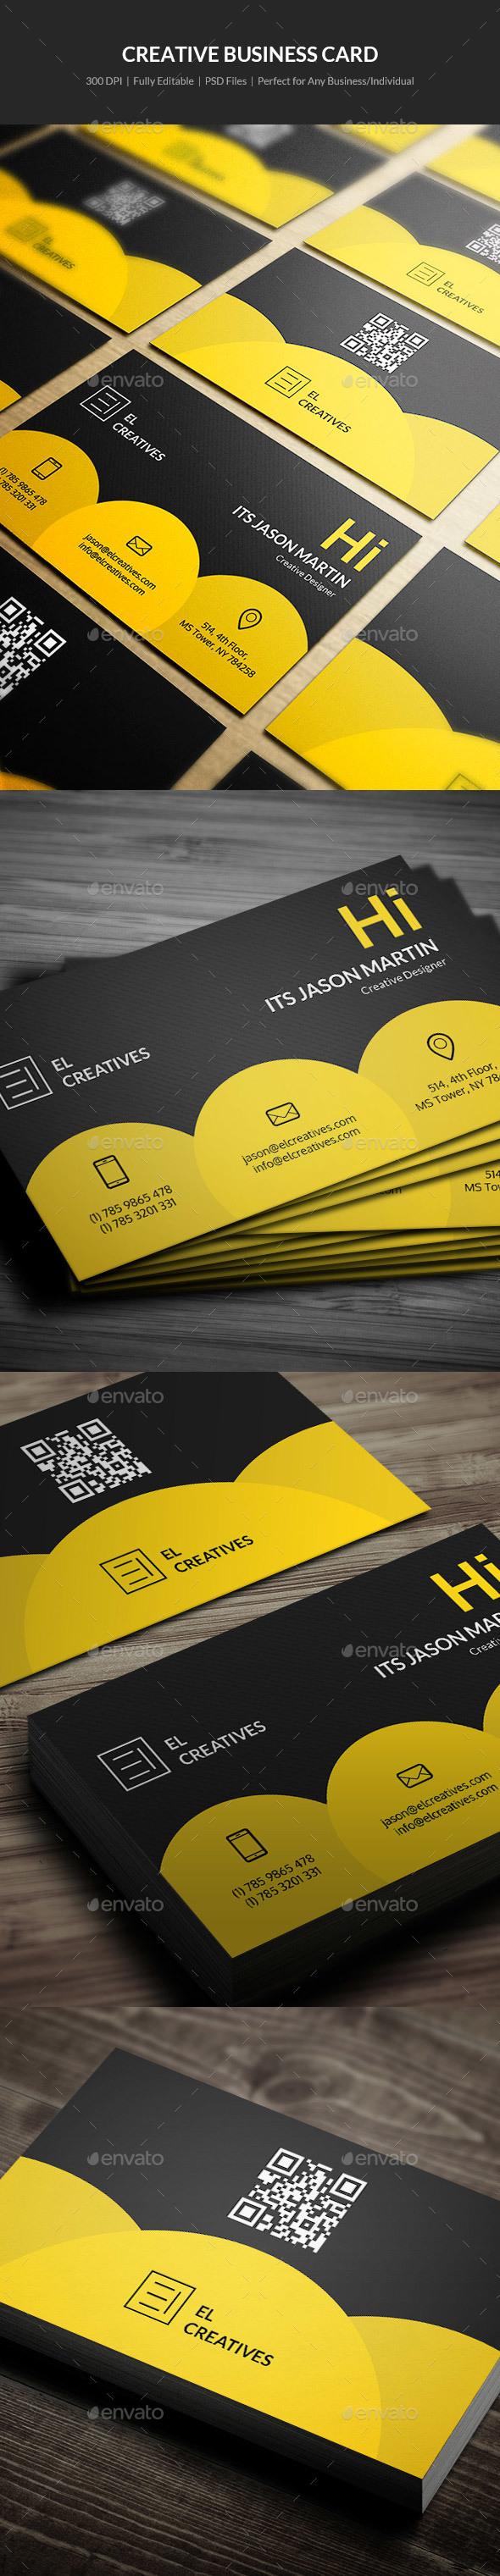 Creative Business Card - 01 - Creative Business Cards